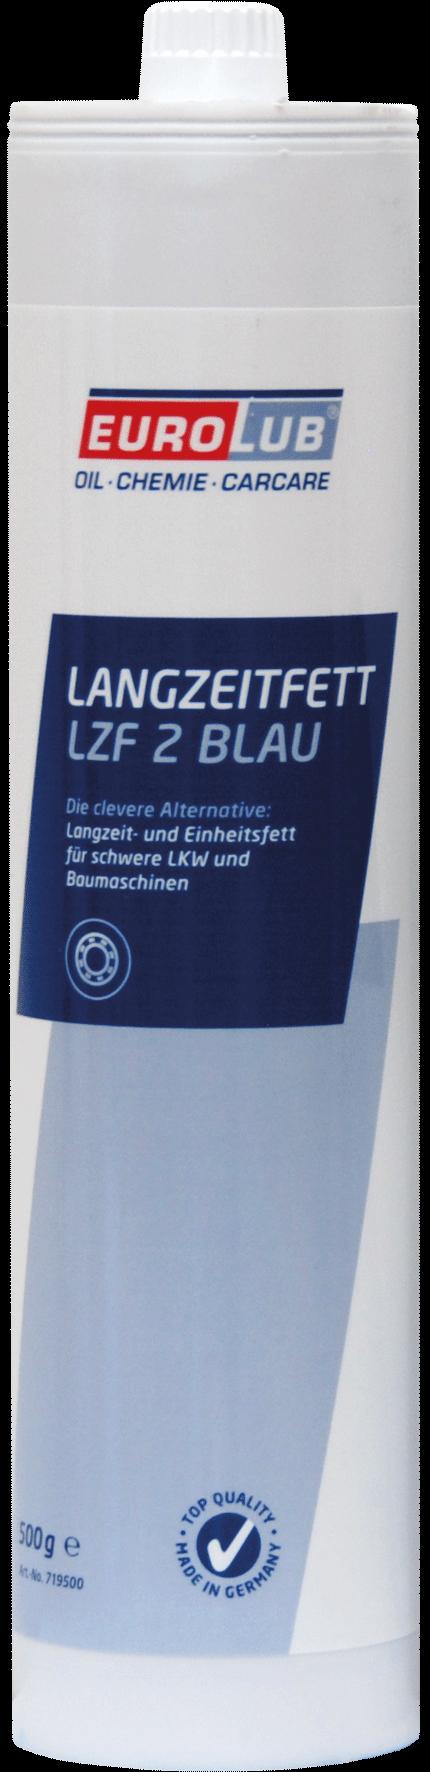 EUROLUB Langzeitfett LZF 2 blau (универсальная смазка), 0.5л